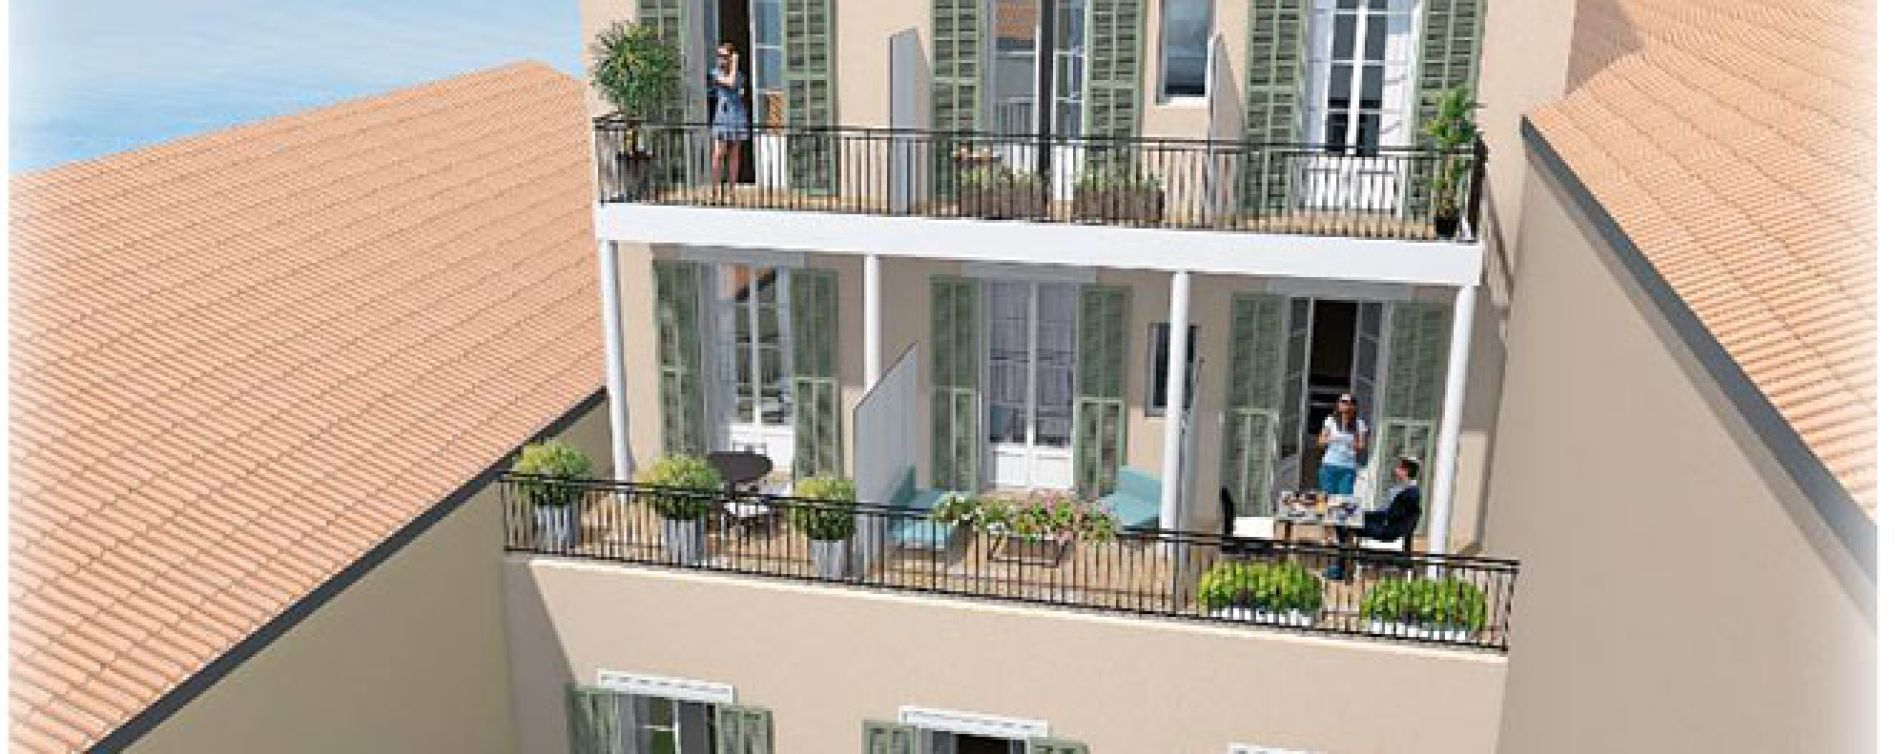 Résidence Villa Gambetta à Cannes